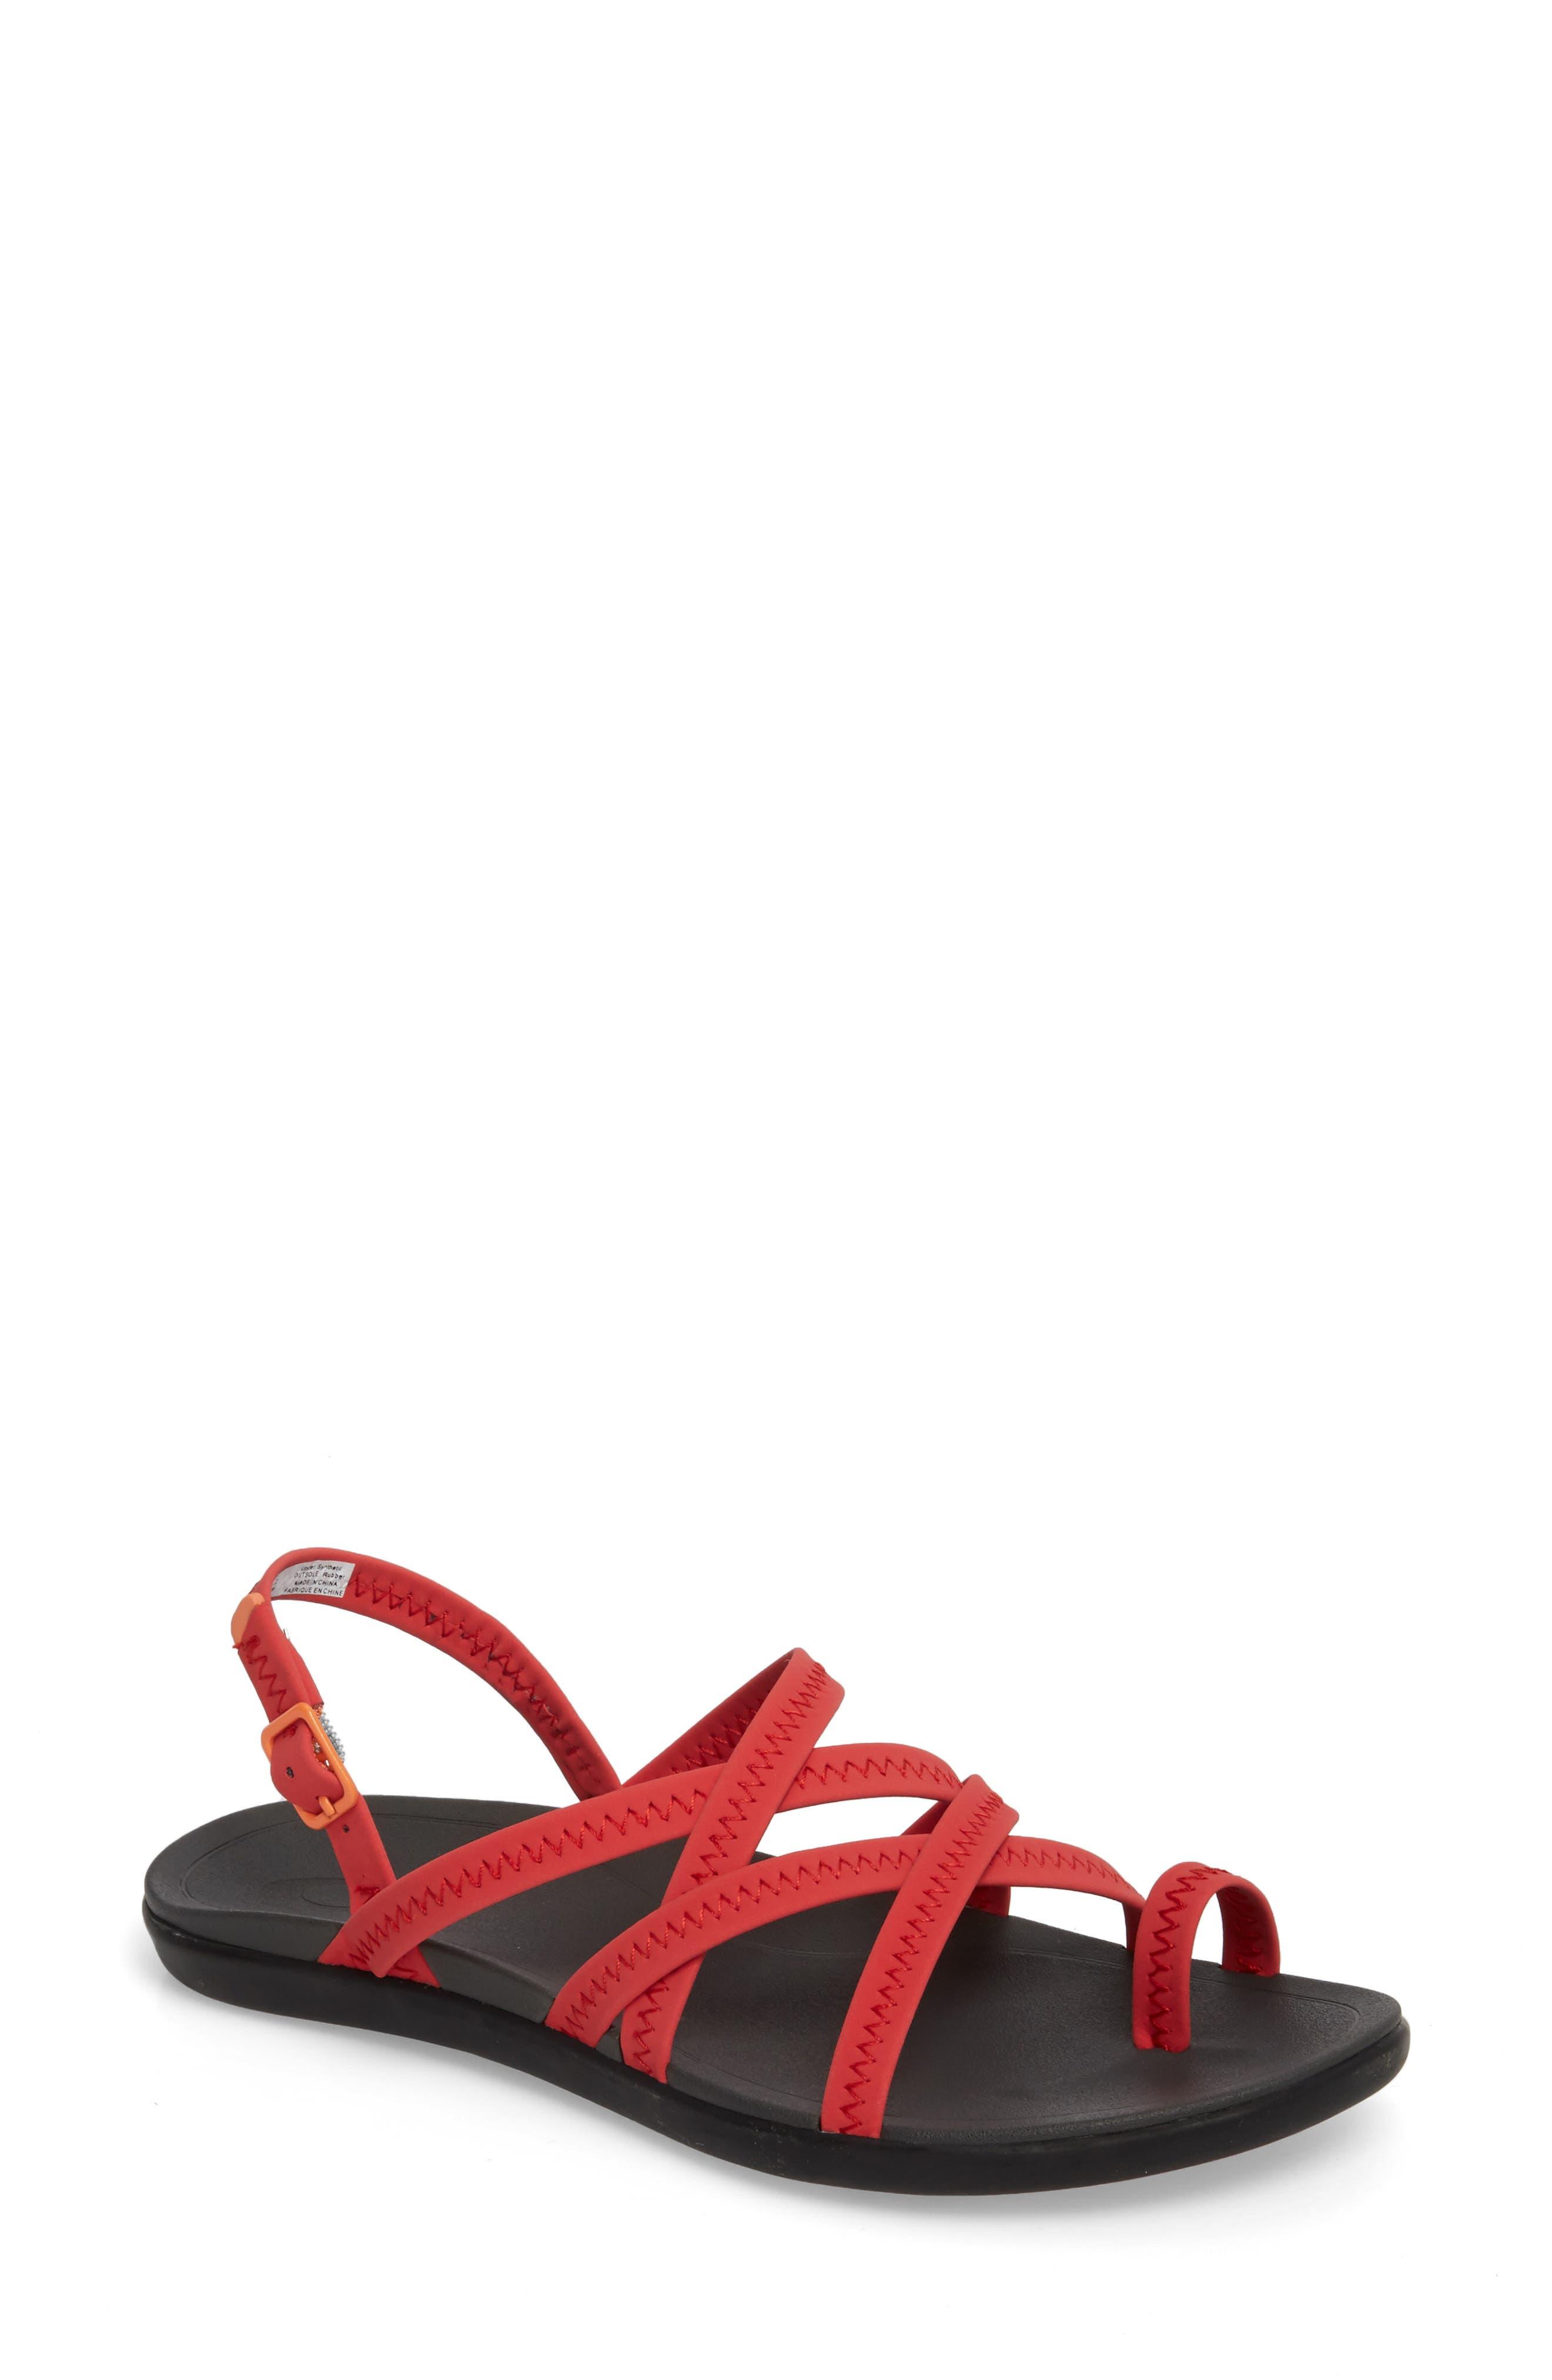 Alternate Image 1 Selected - OluKai Kalapu Sandal (Women)